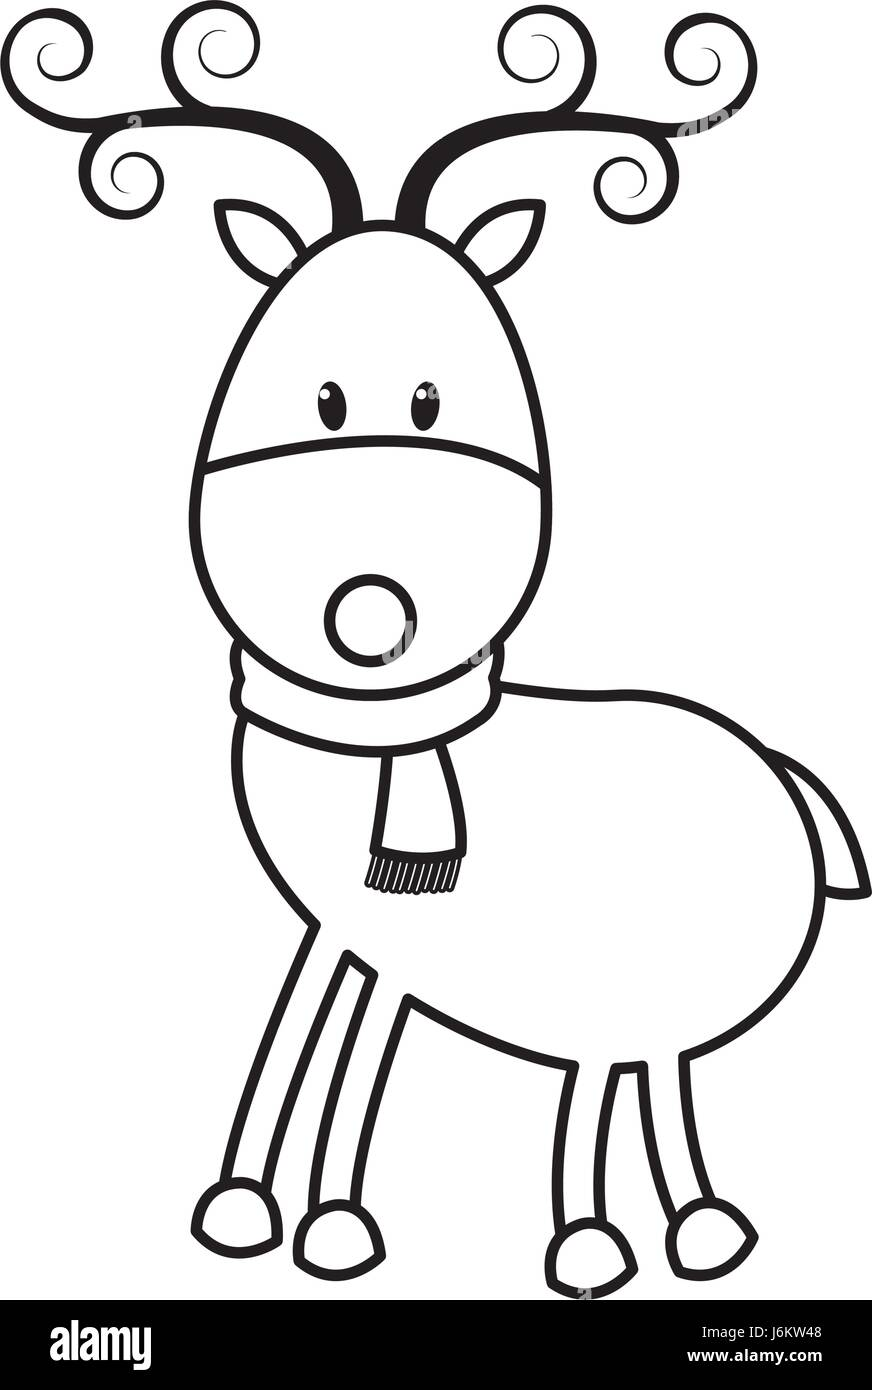 christmas cute reindeer scarf standing animal cartoon outline stock